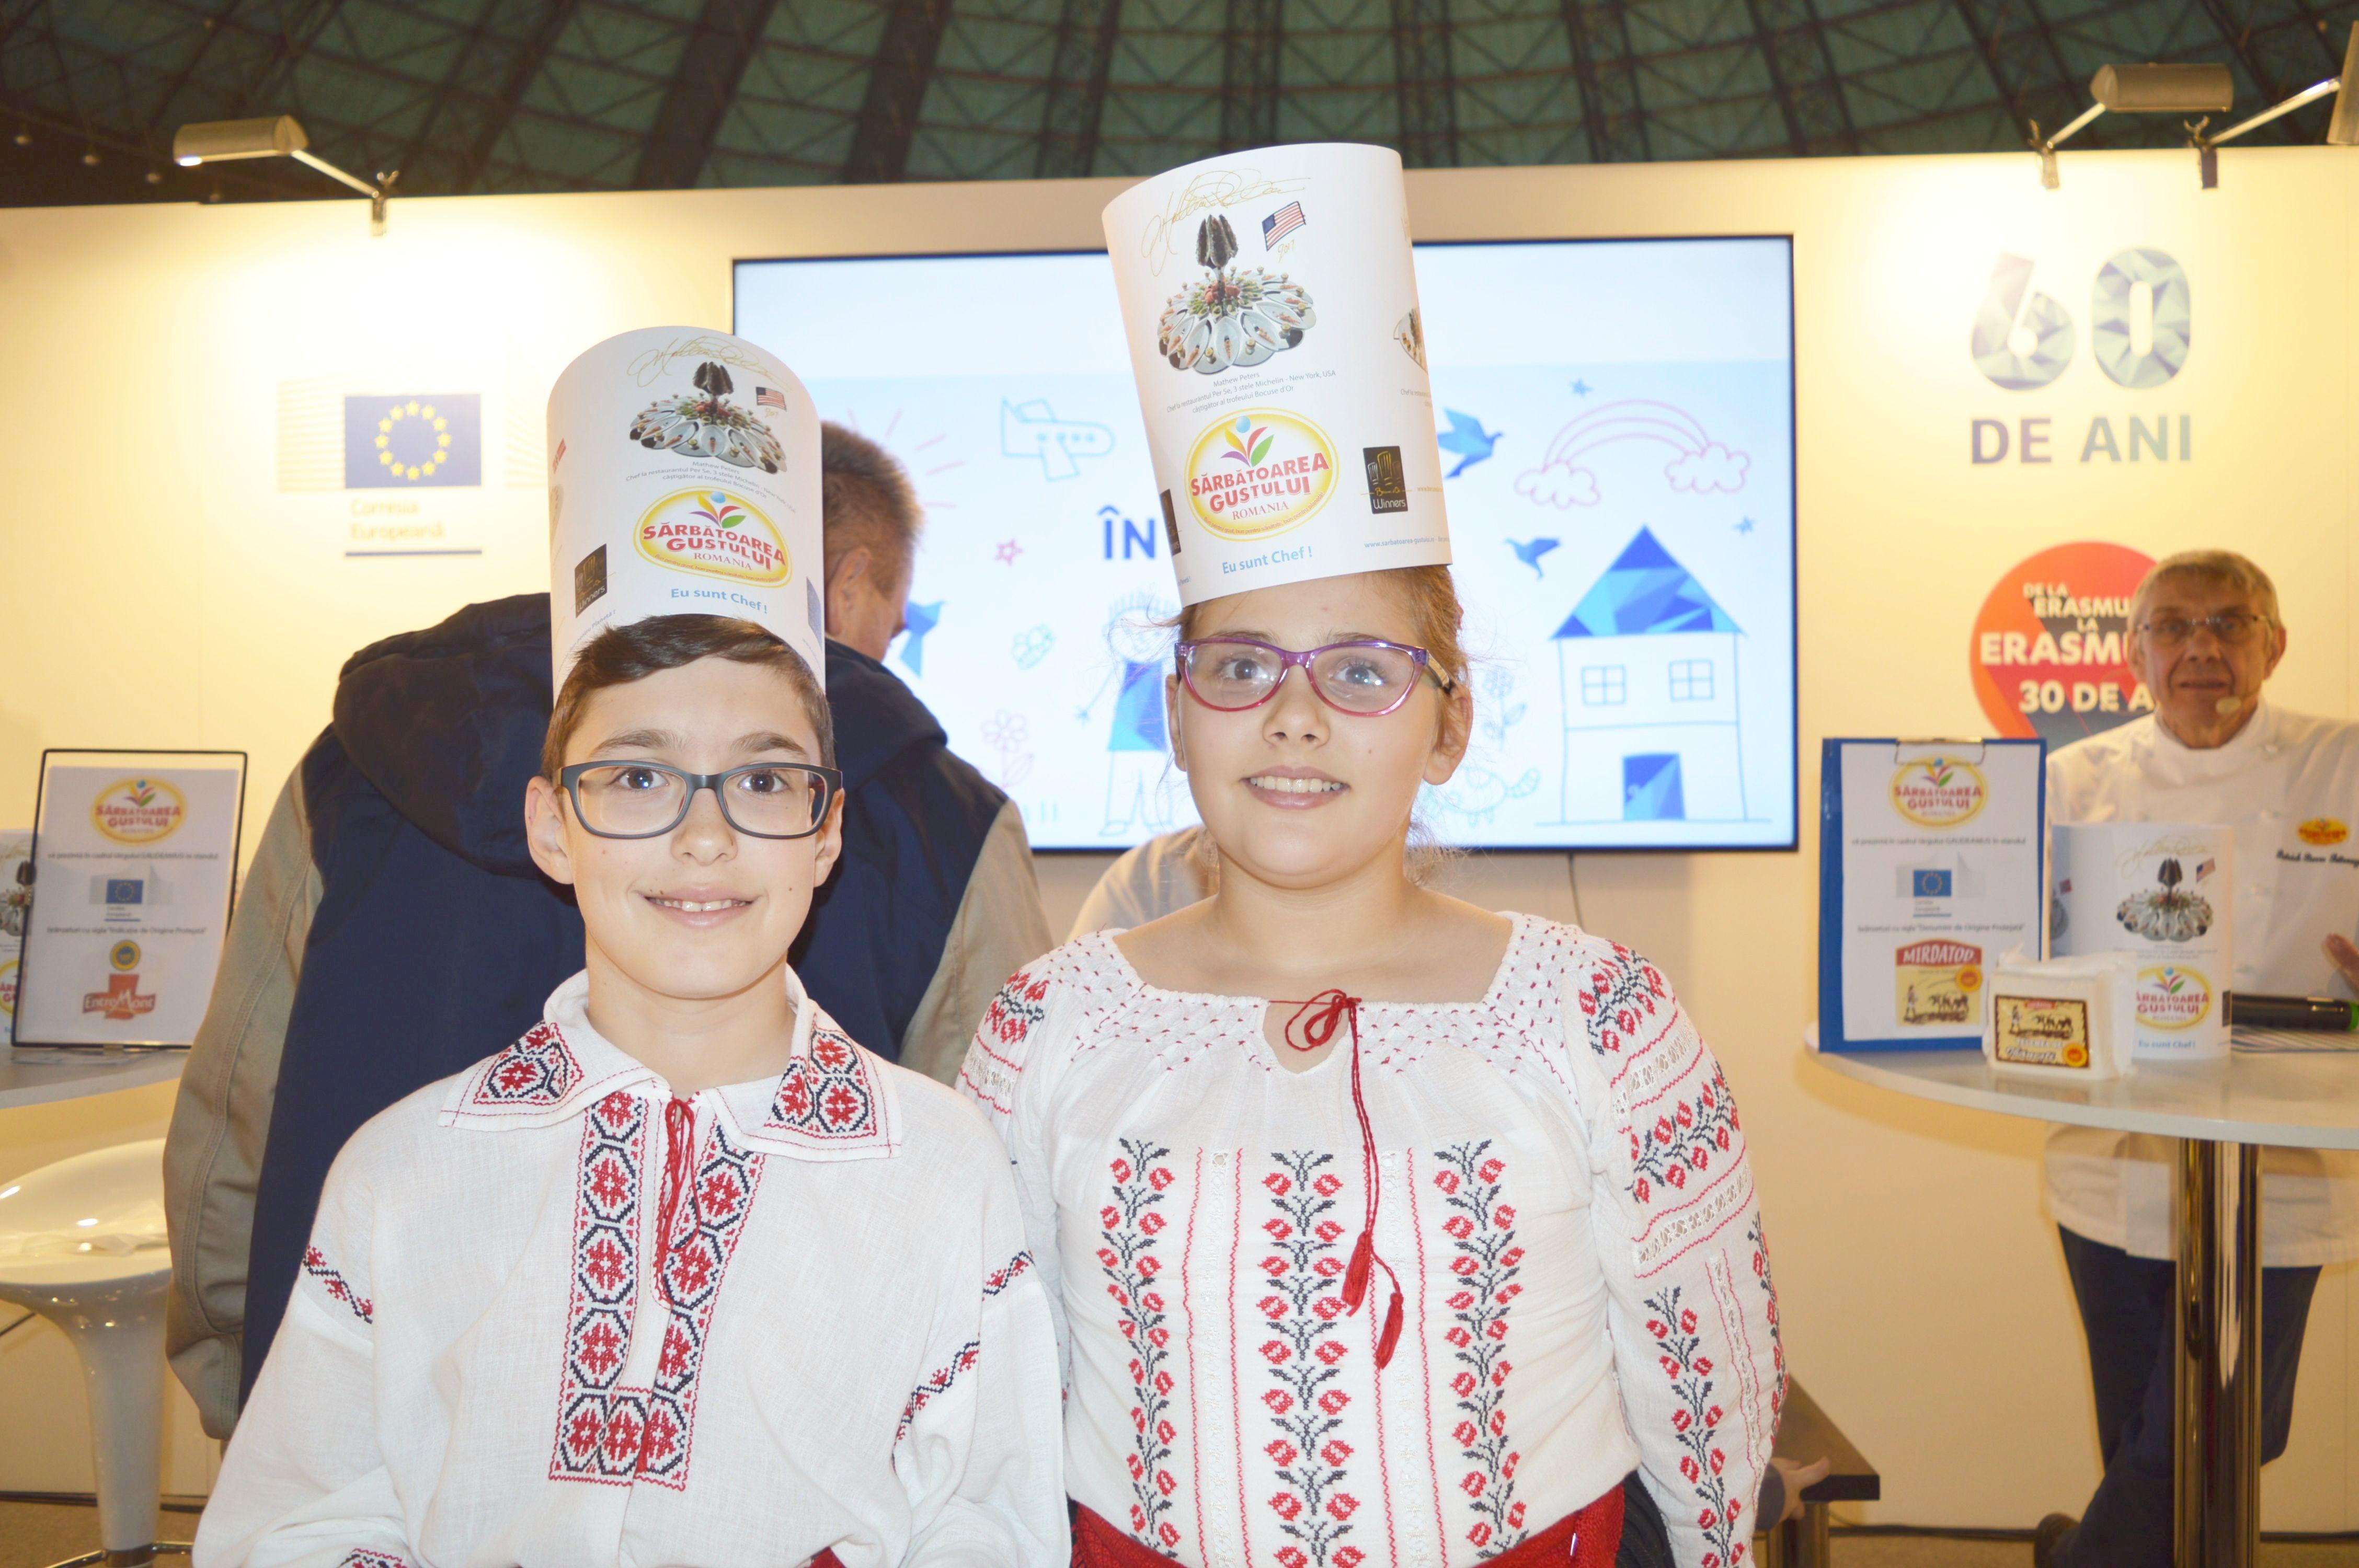 Sarbatoarea_Gustului_Gaudeamus_Reprezentanta_Comisiei_Europene_in_Romania_02